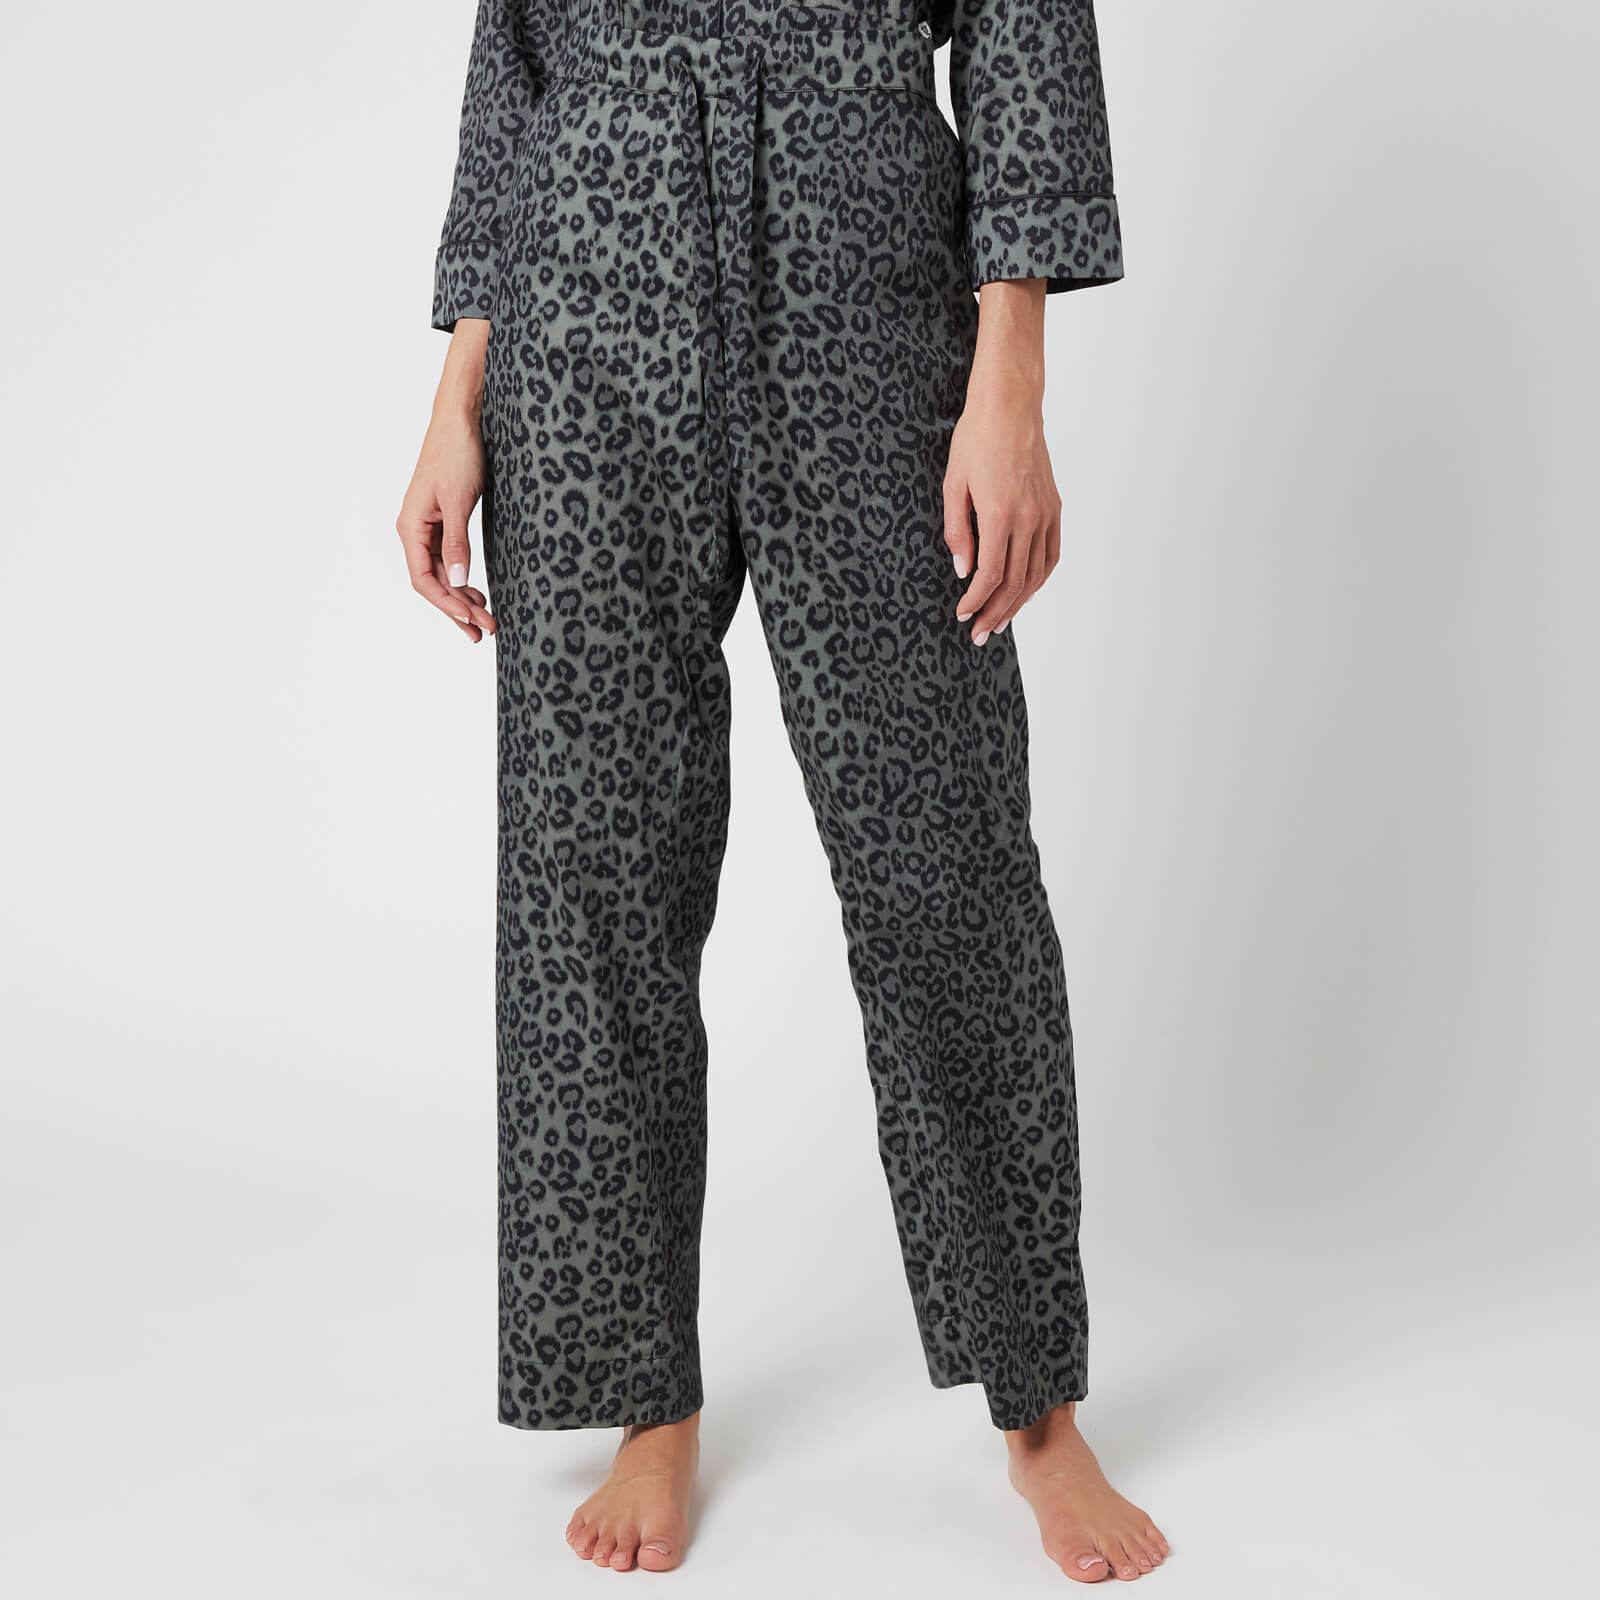 Les Girls Les Boys Women's Girls PJ Bottoms - Grey Leopard - XS